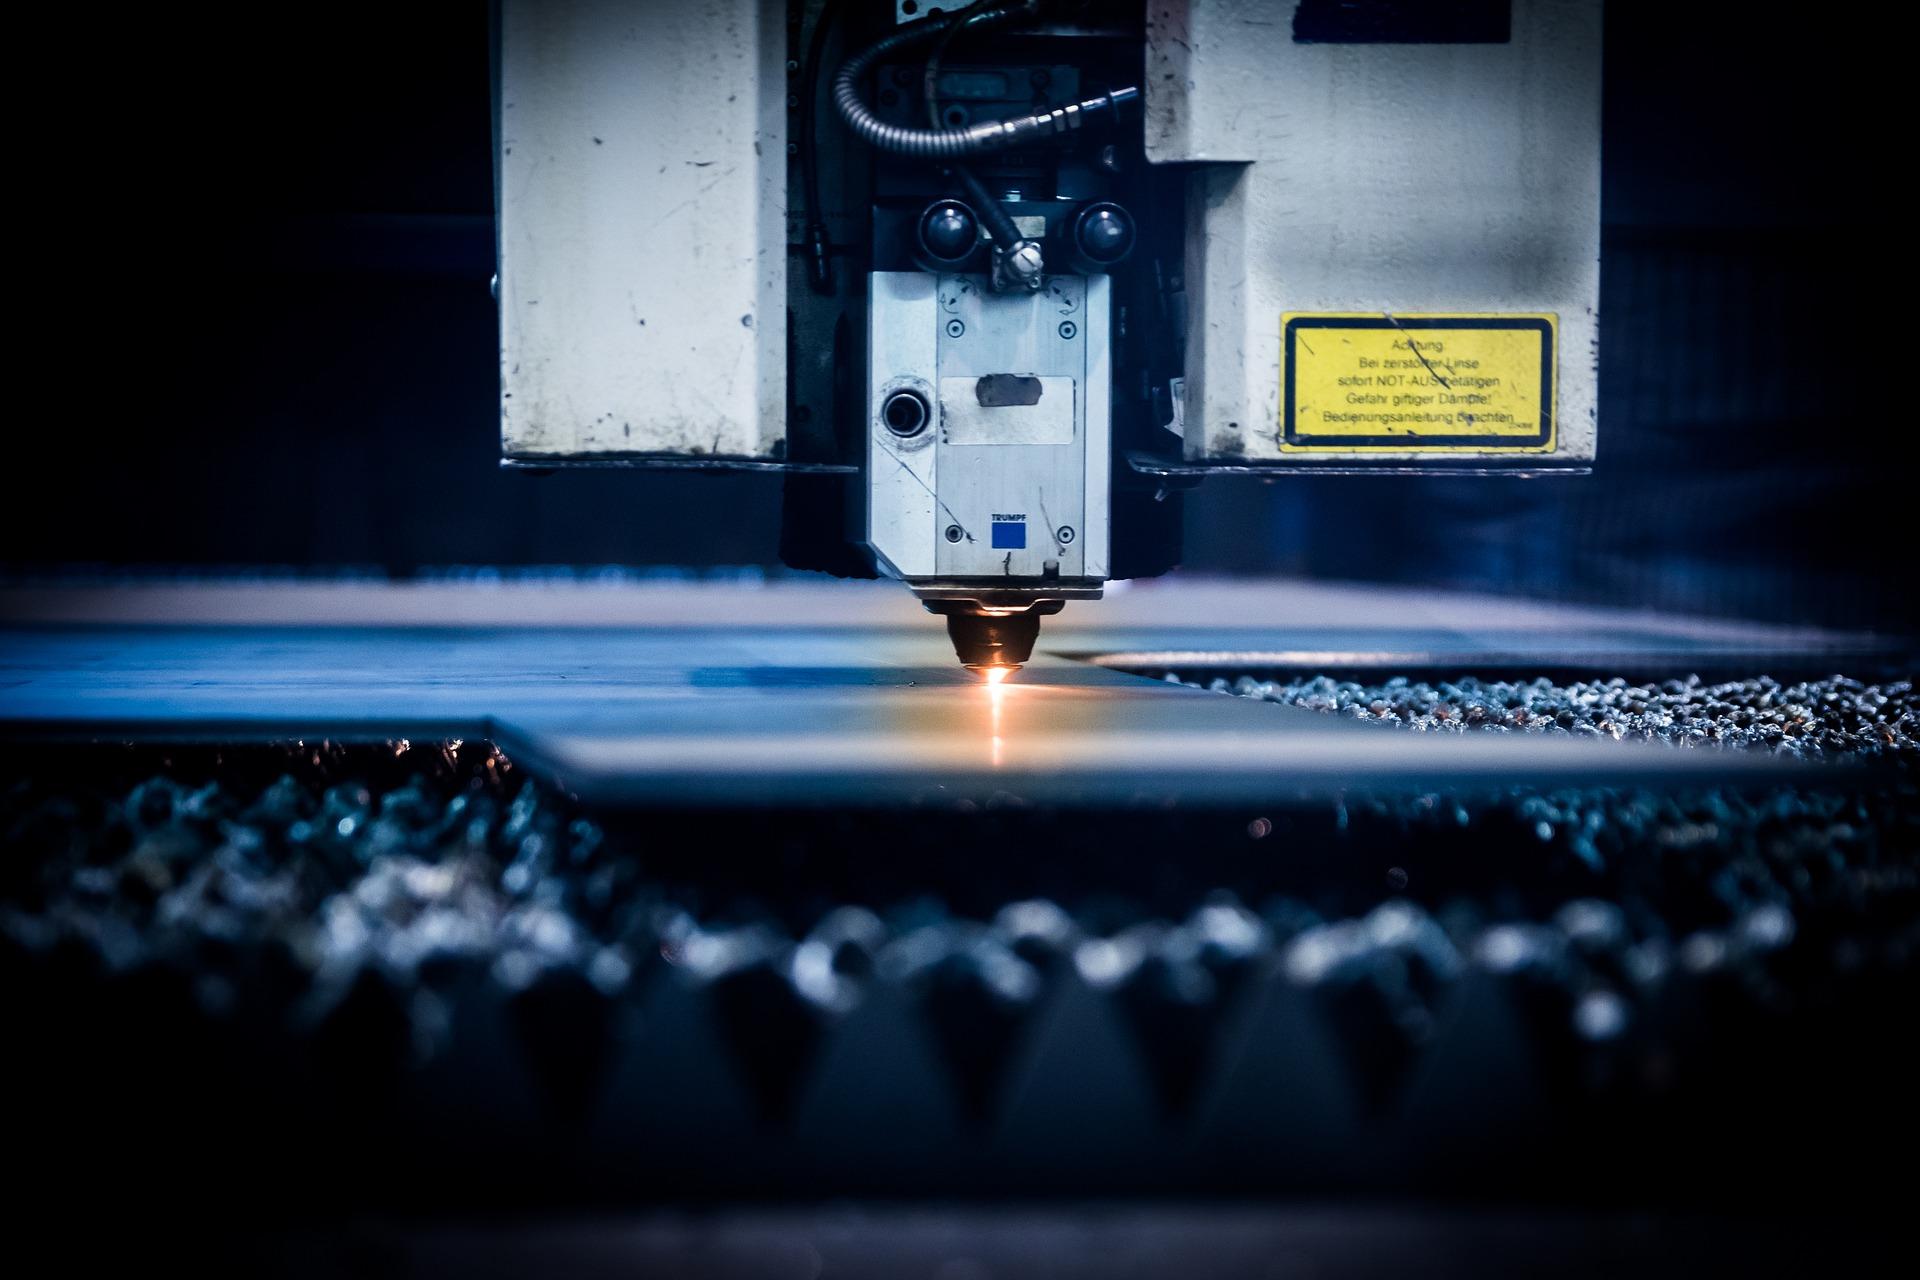 IoT & macchinari industriali con noleggio operativo Domorental